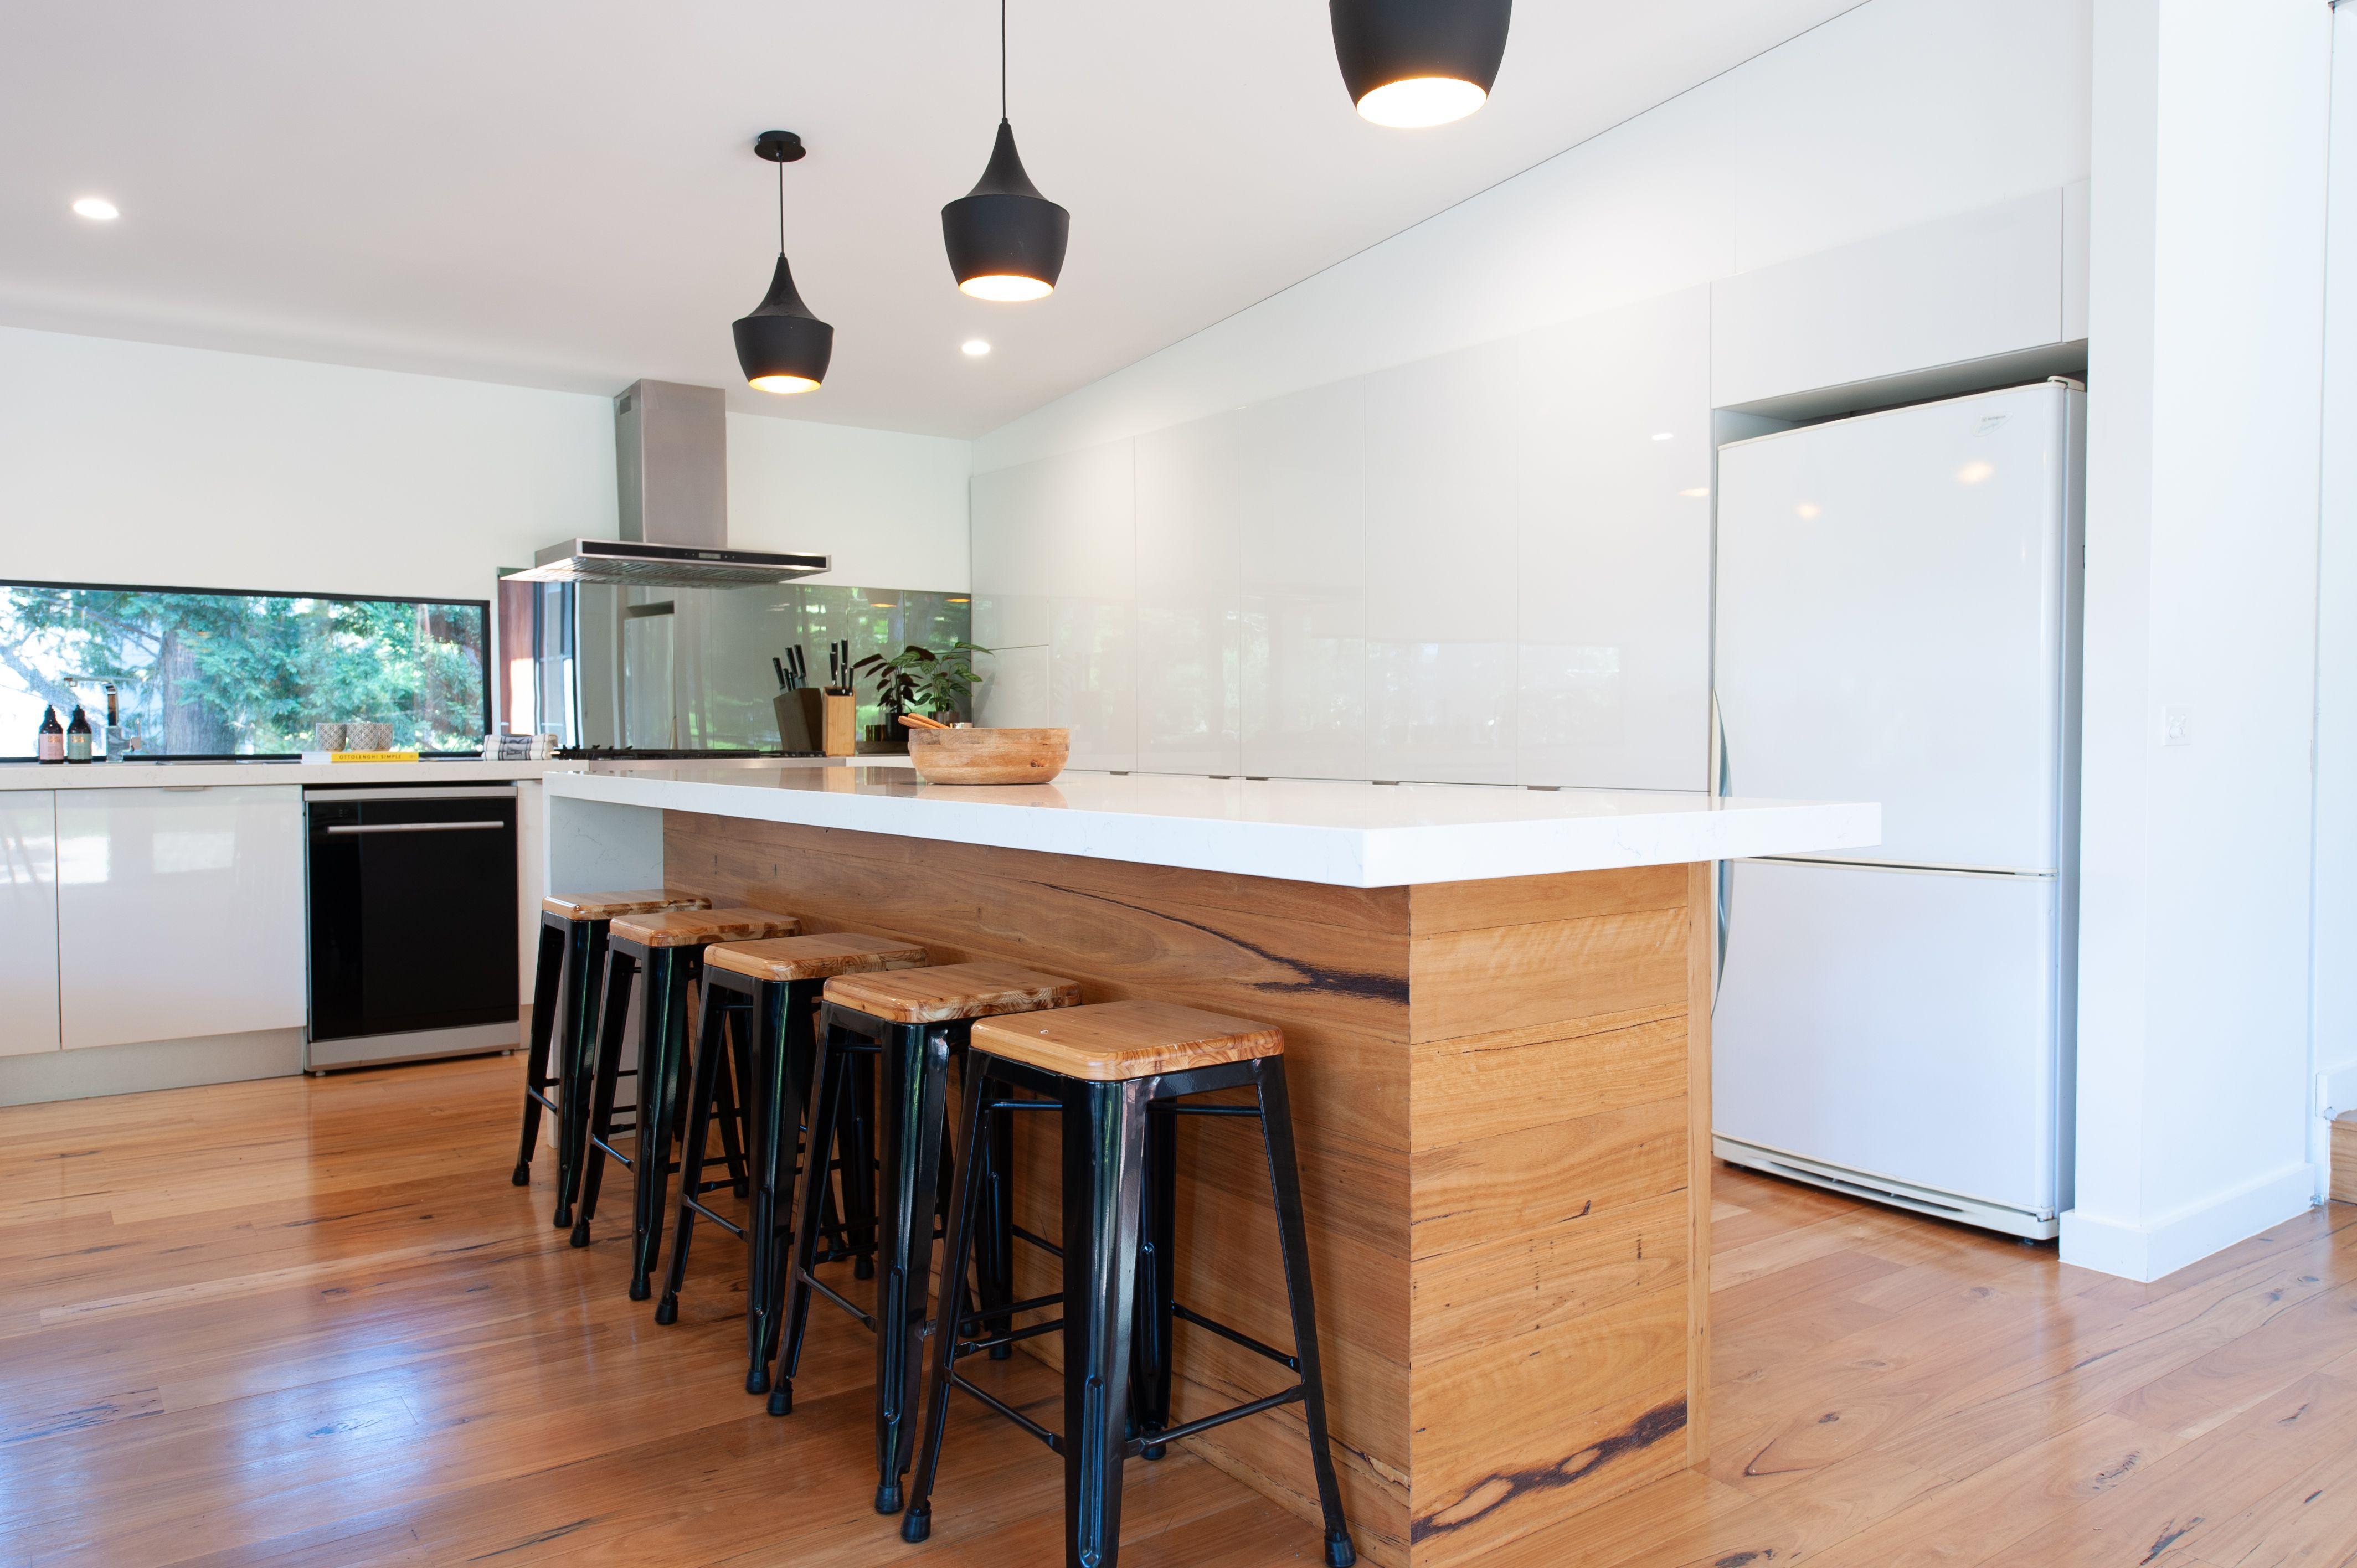 Sorrento Beachhouse Kitchen designed by Zesta Kitchens